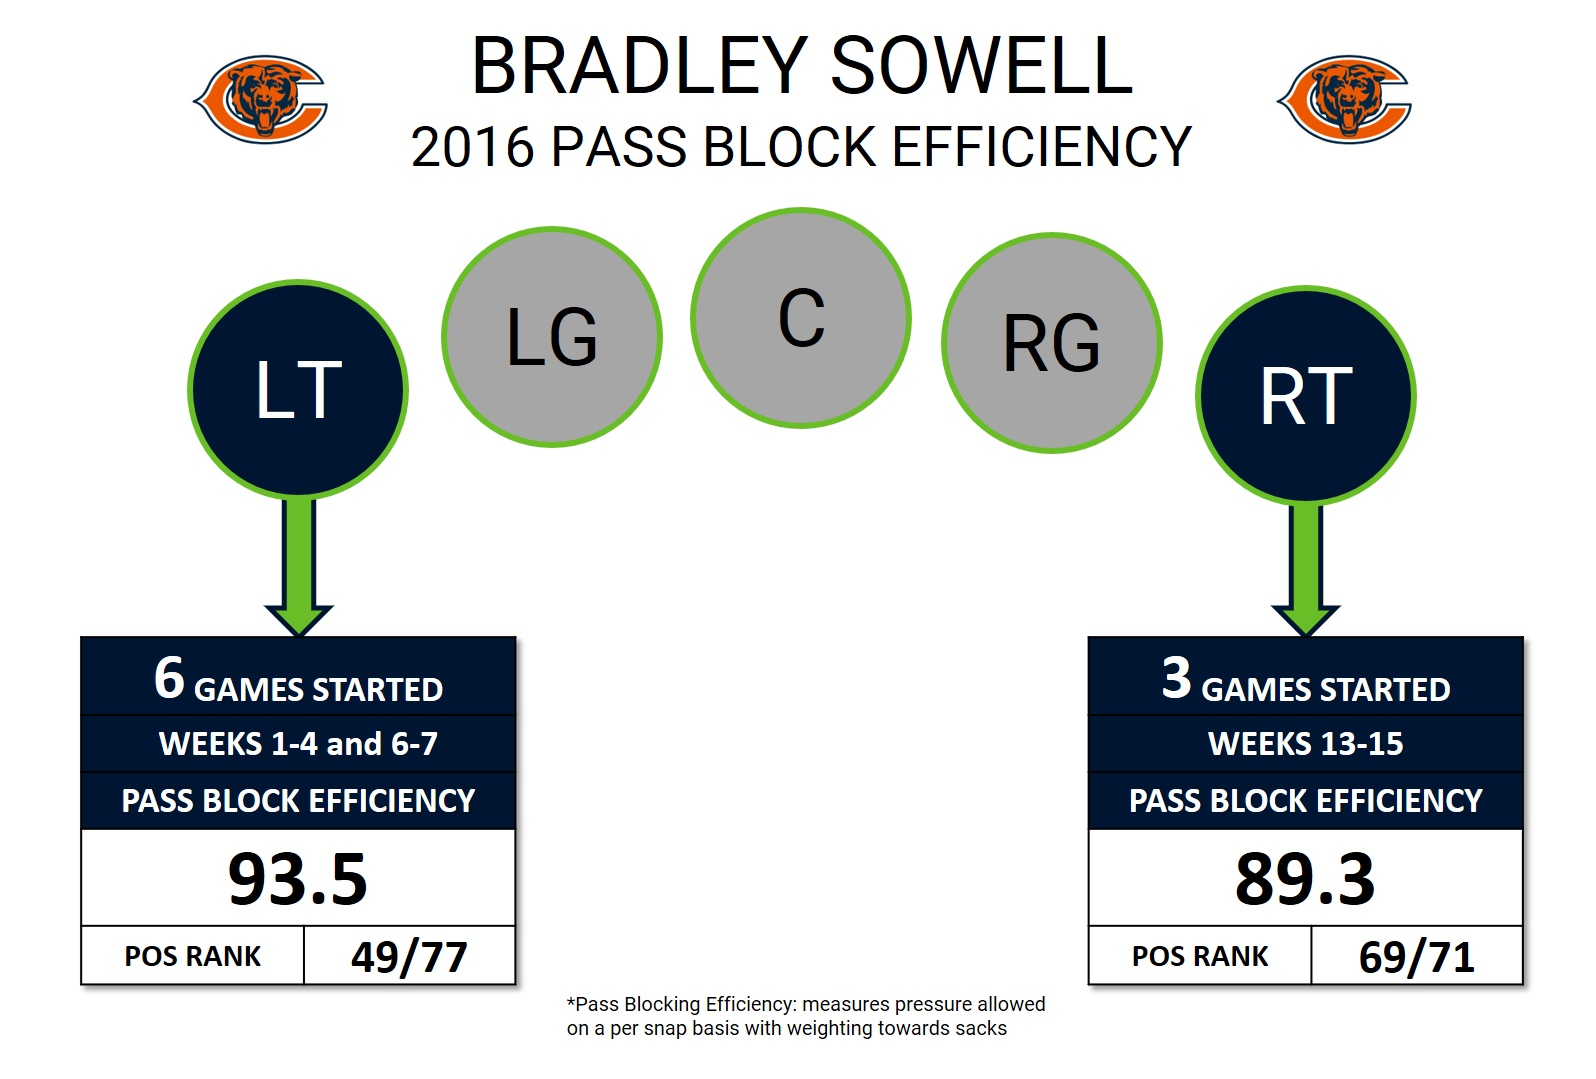 Bradley Sowell